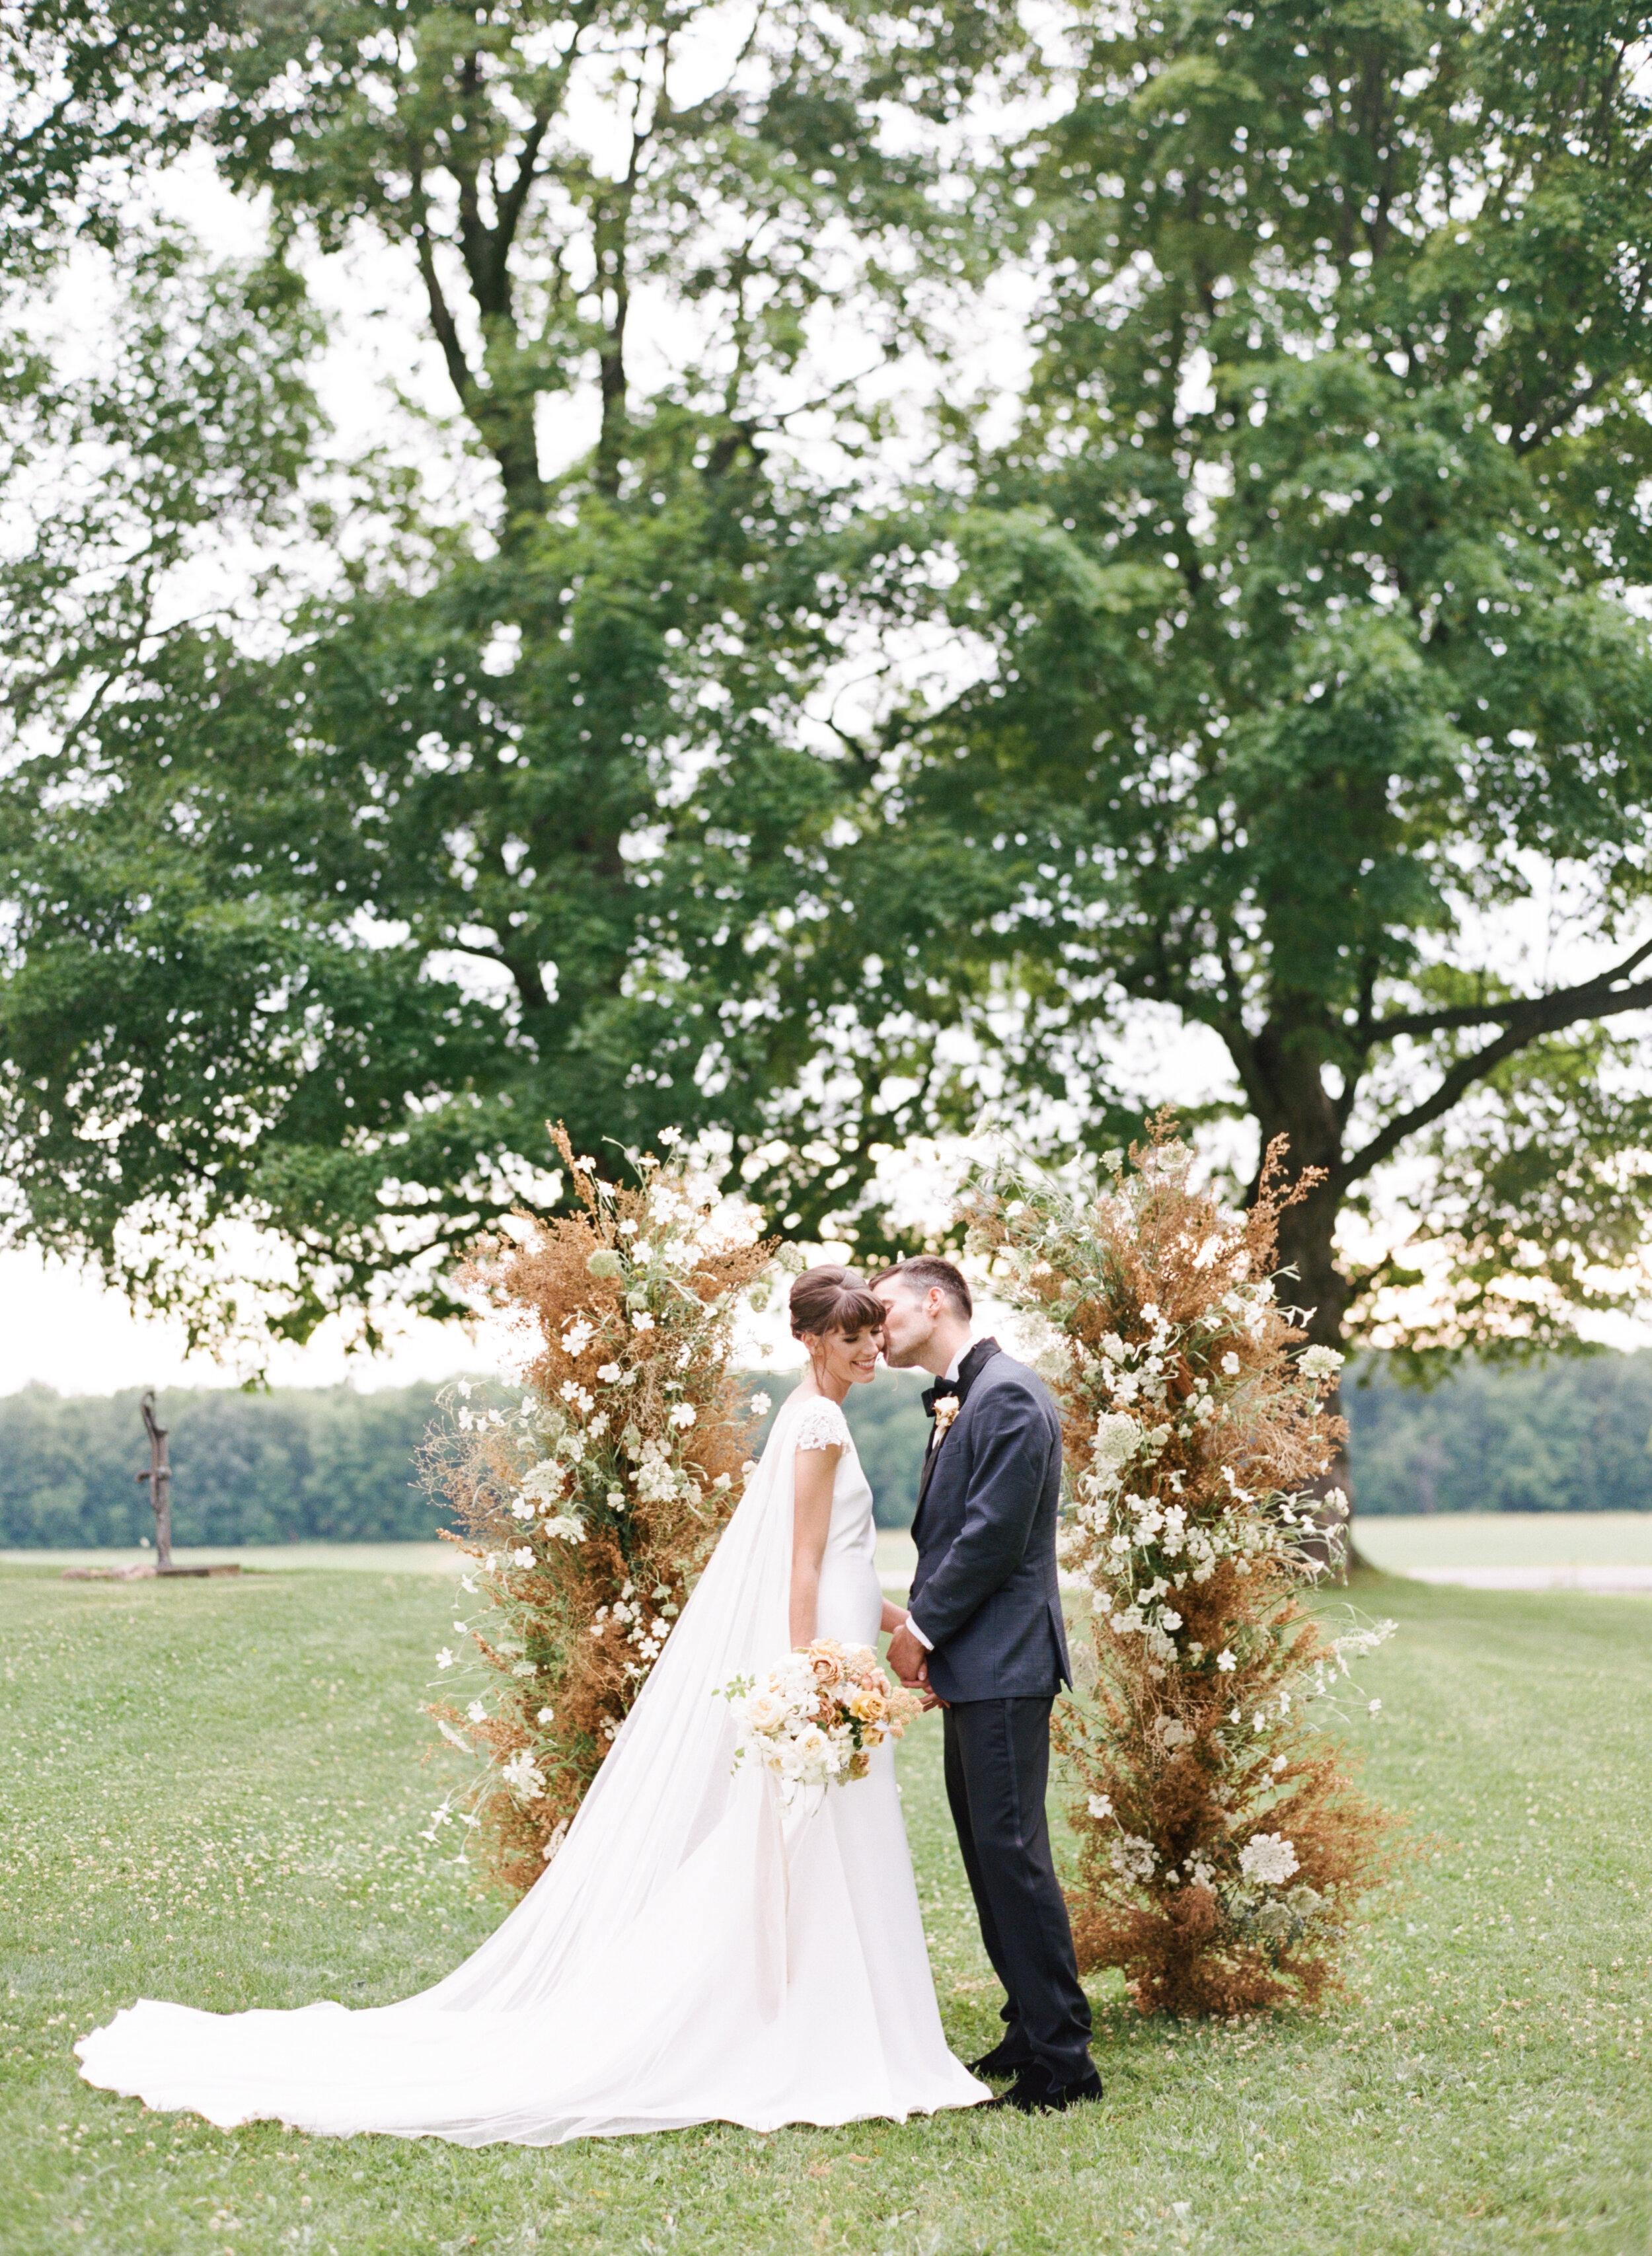 alexandra-meseke-understated-soft-luxury-wedding-upstate-ny_0105.jpg